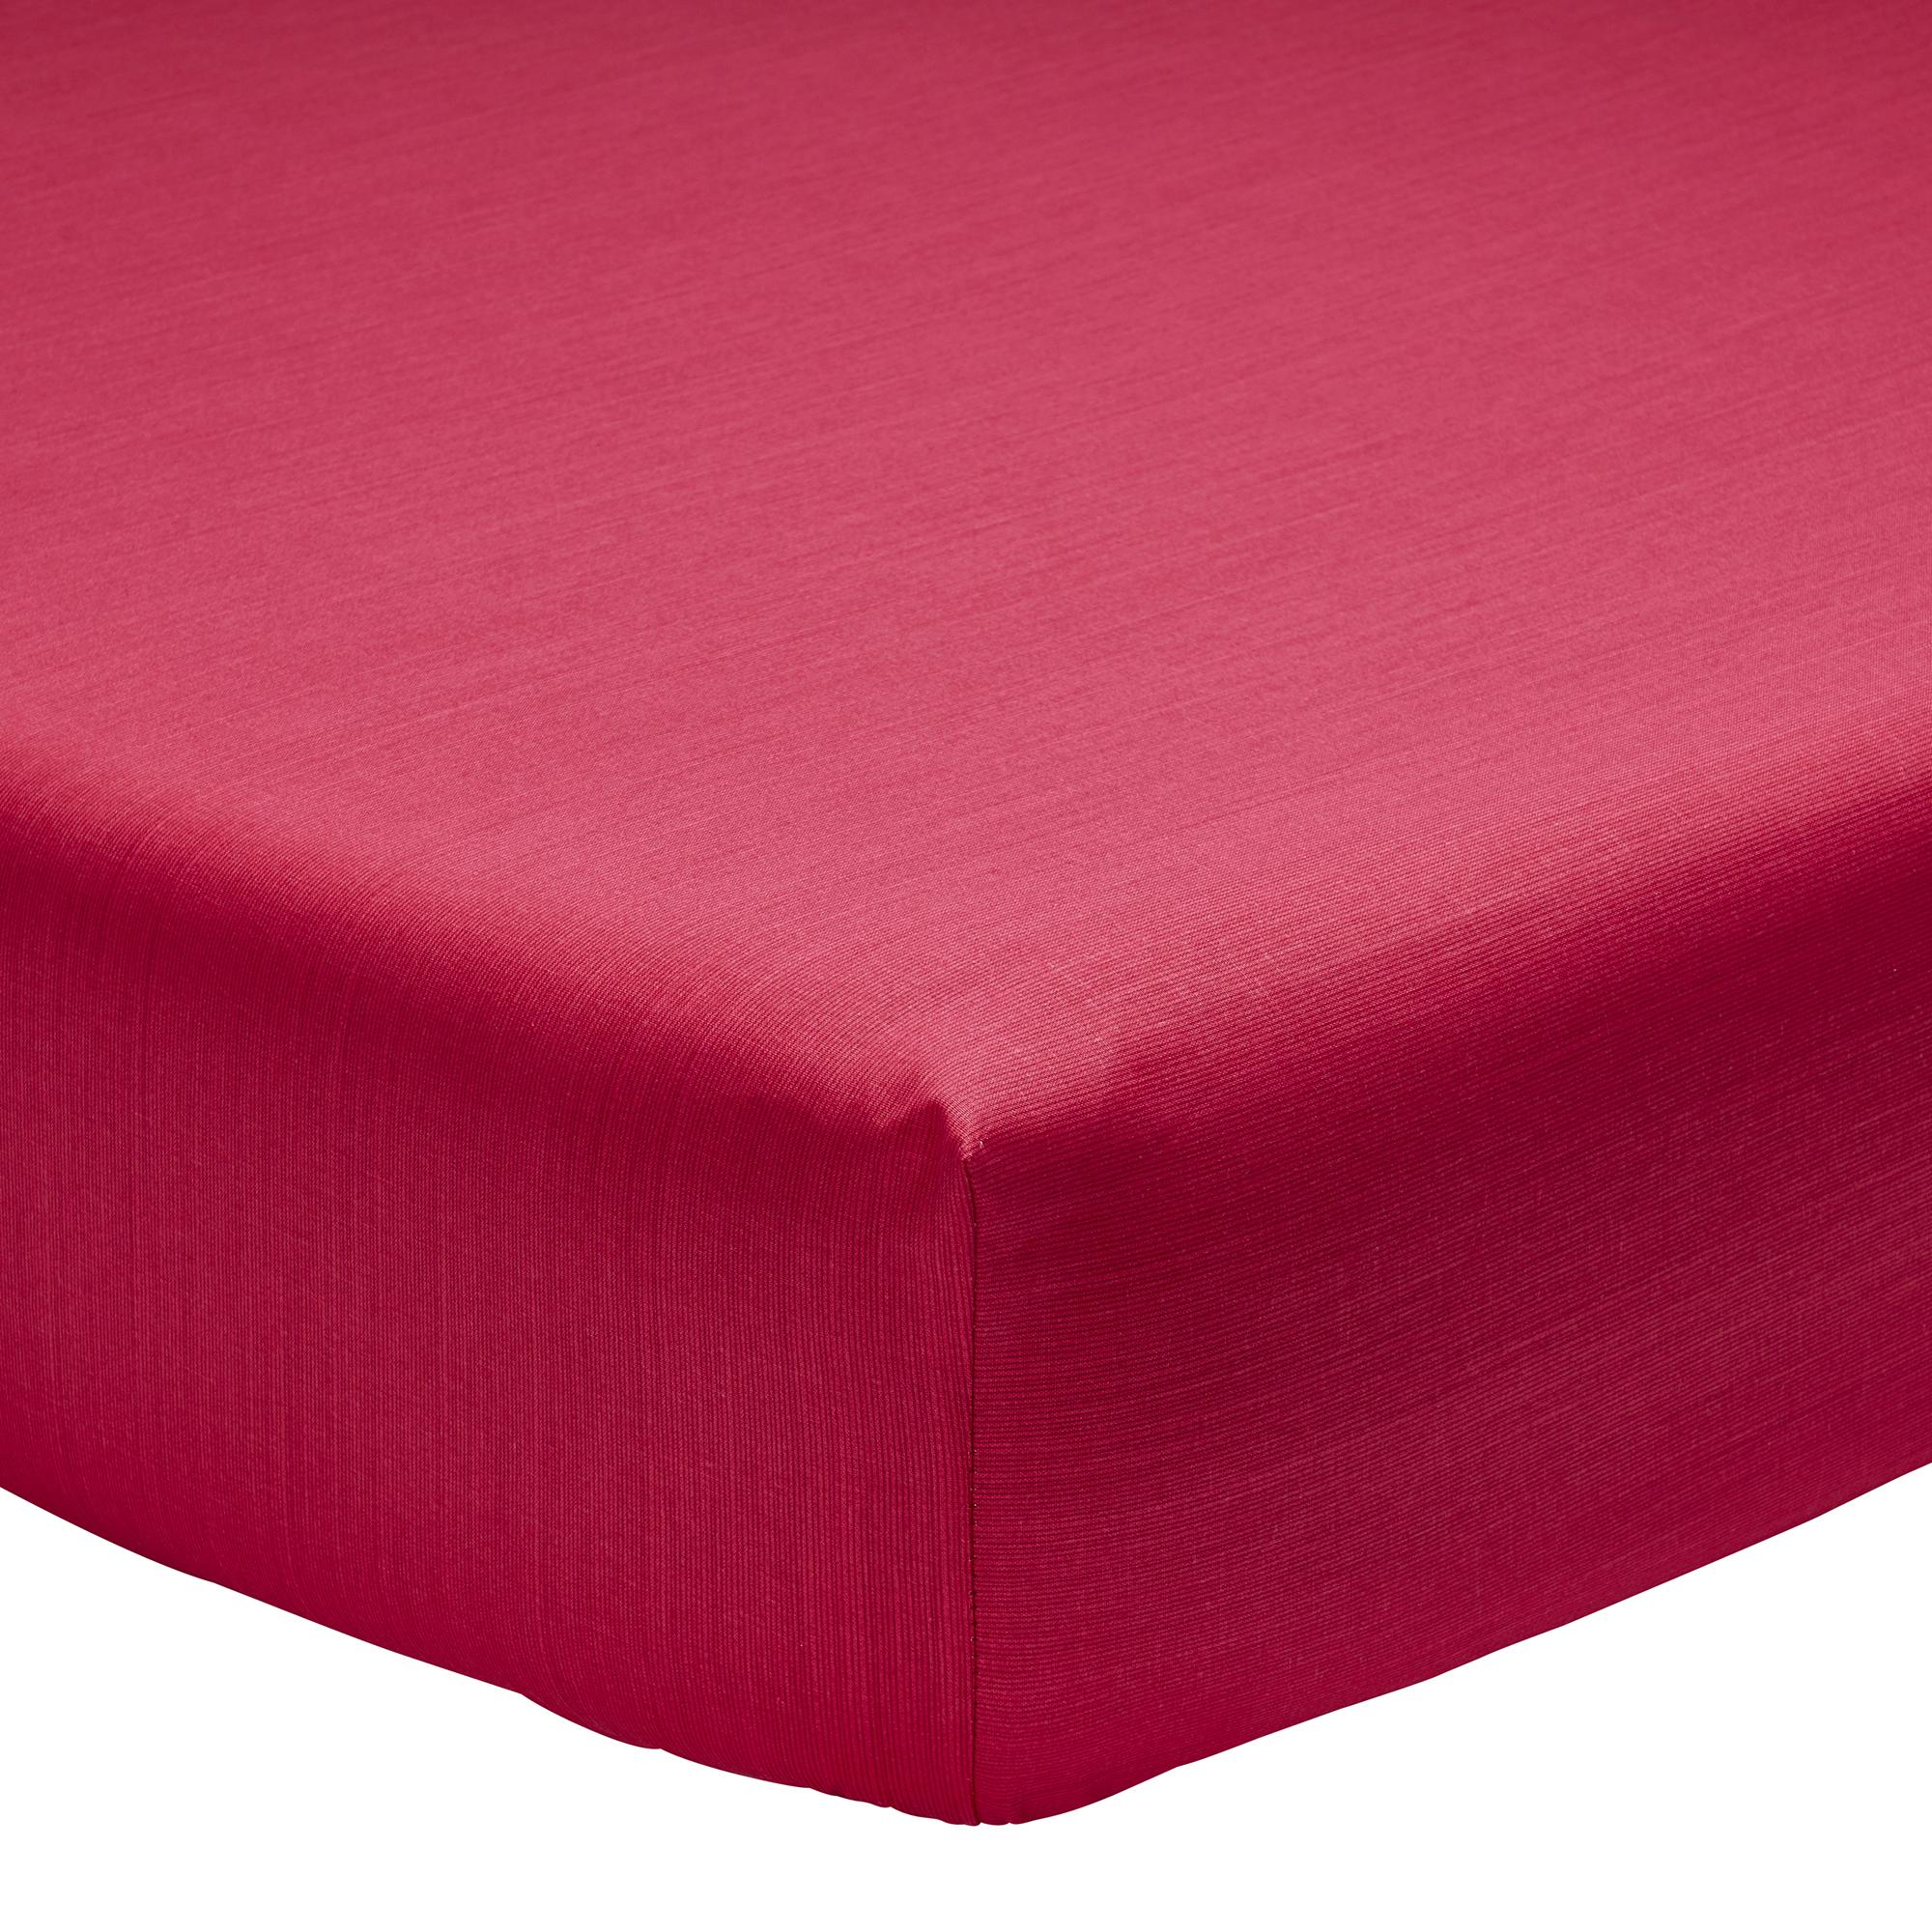 Drap housse fines rayures en bambou rouge 90 x 190